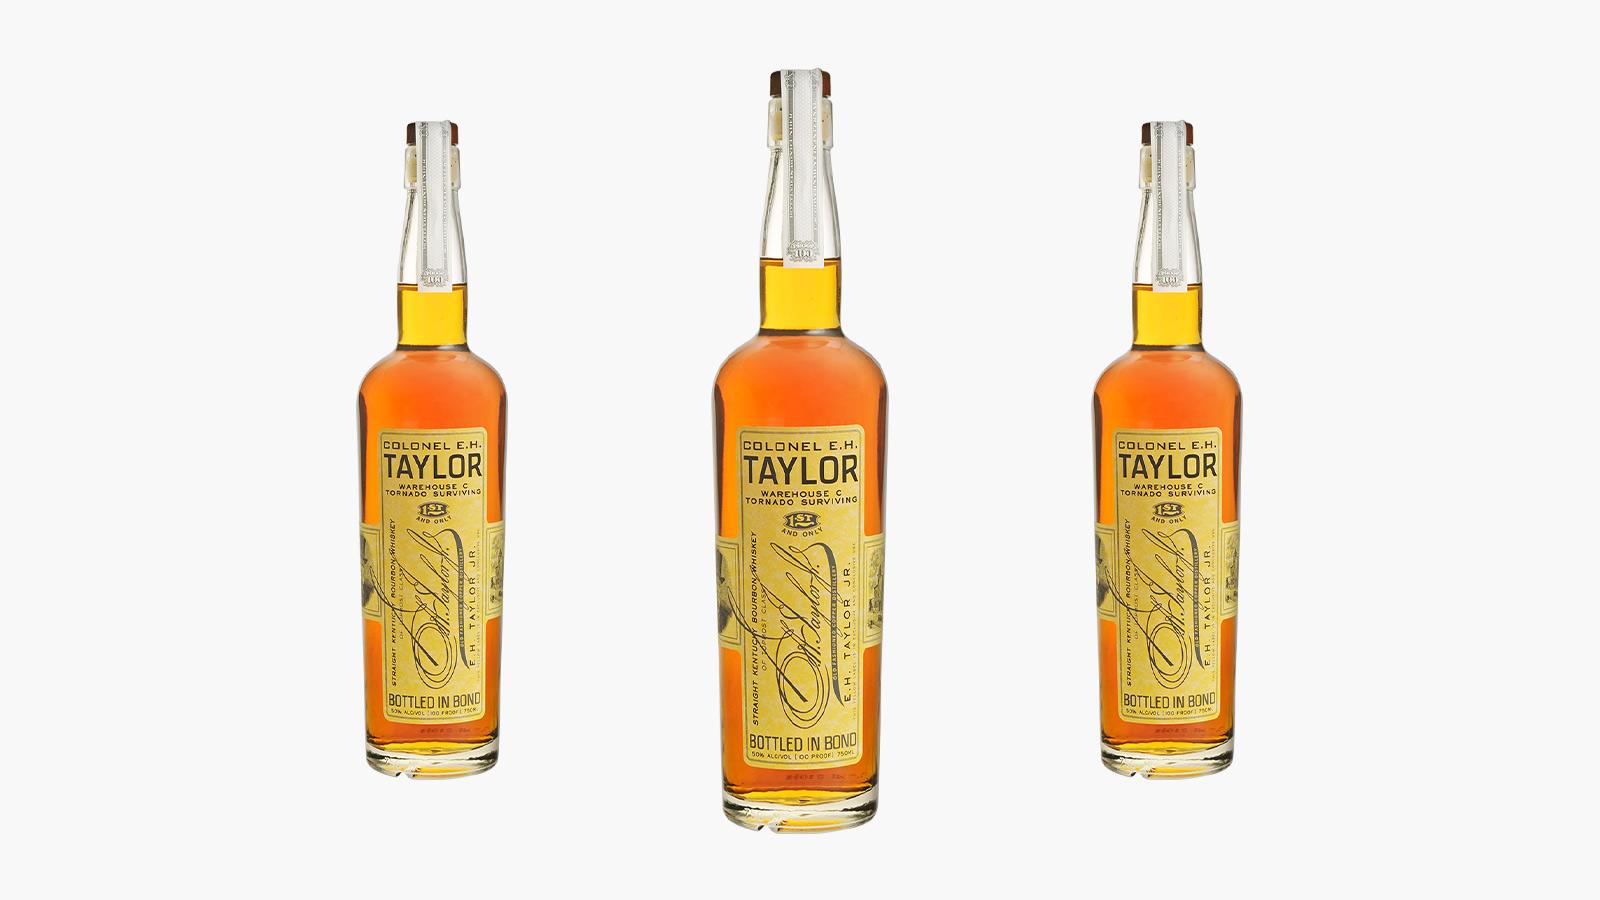 Buffalo Trace Distillery Col. E.H. Taylor, Jr. Warehouse C Bourbon